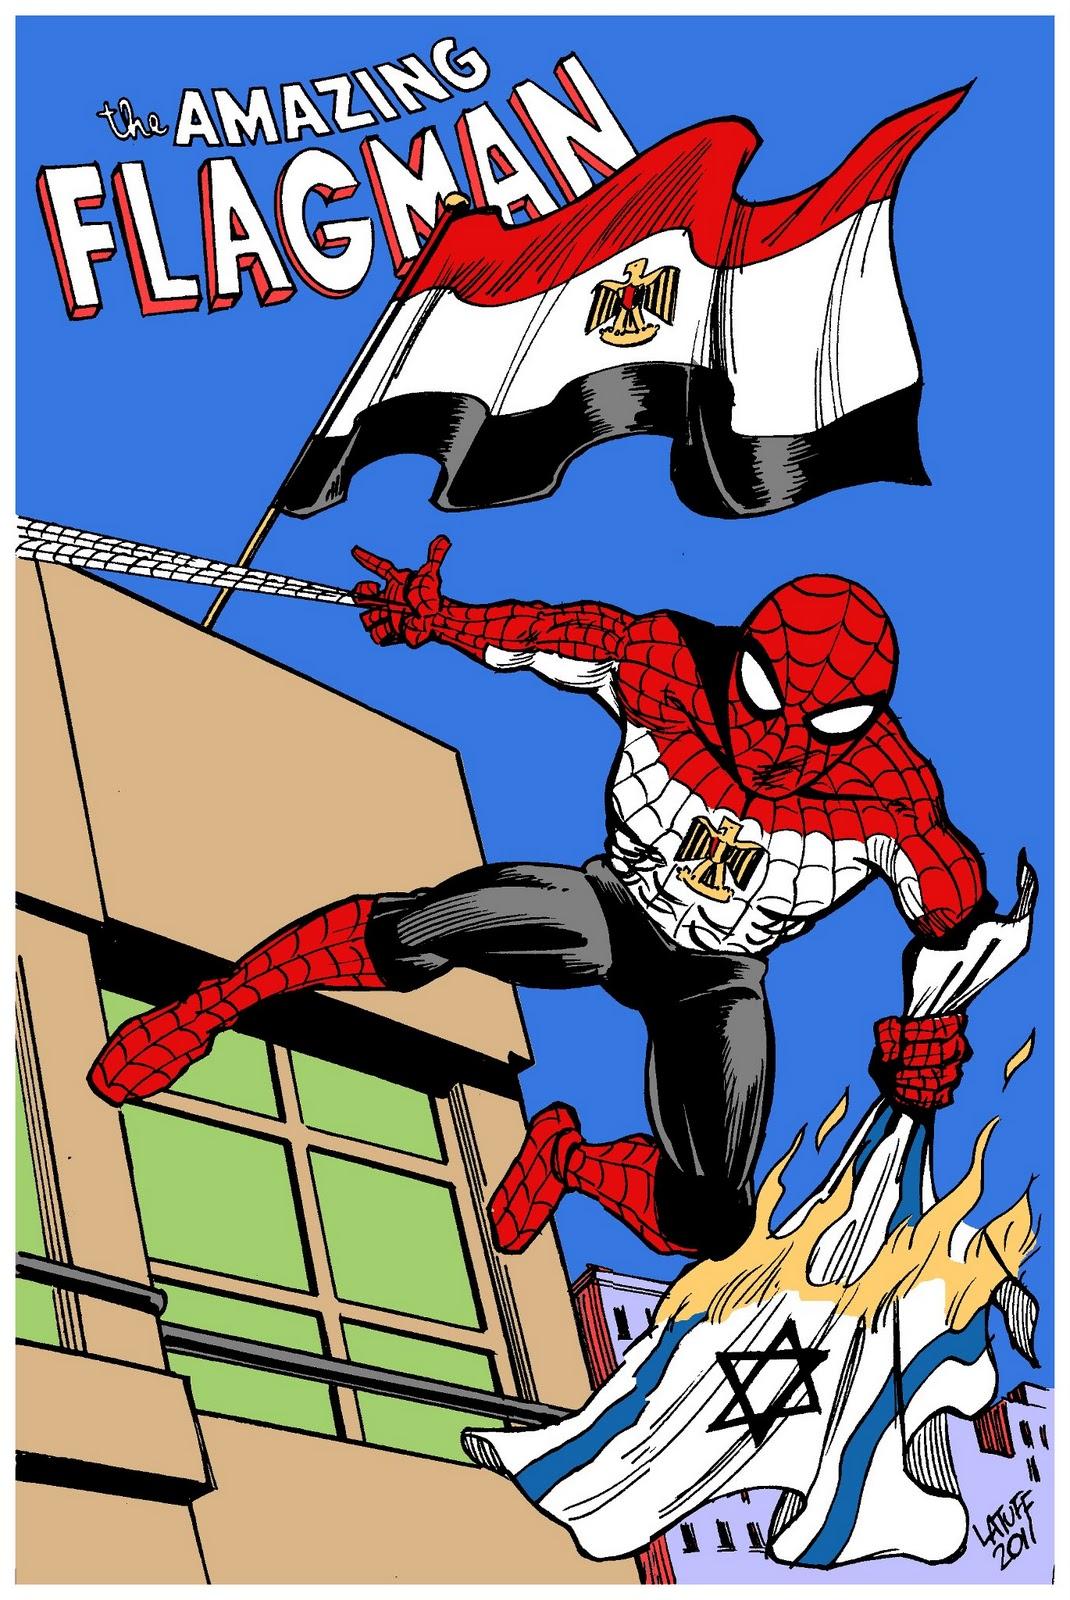 The Amazing Flagman! Cartoon by Carlos Latuff